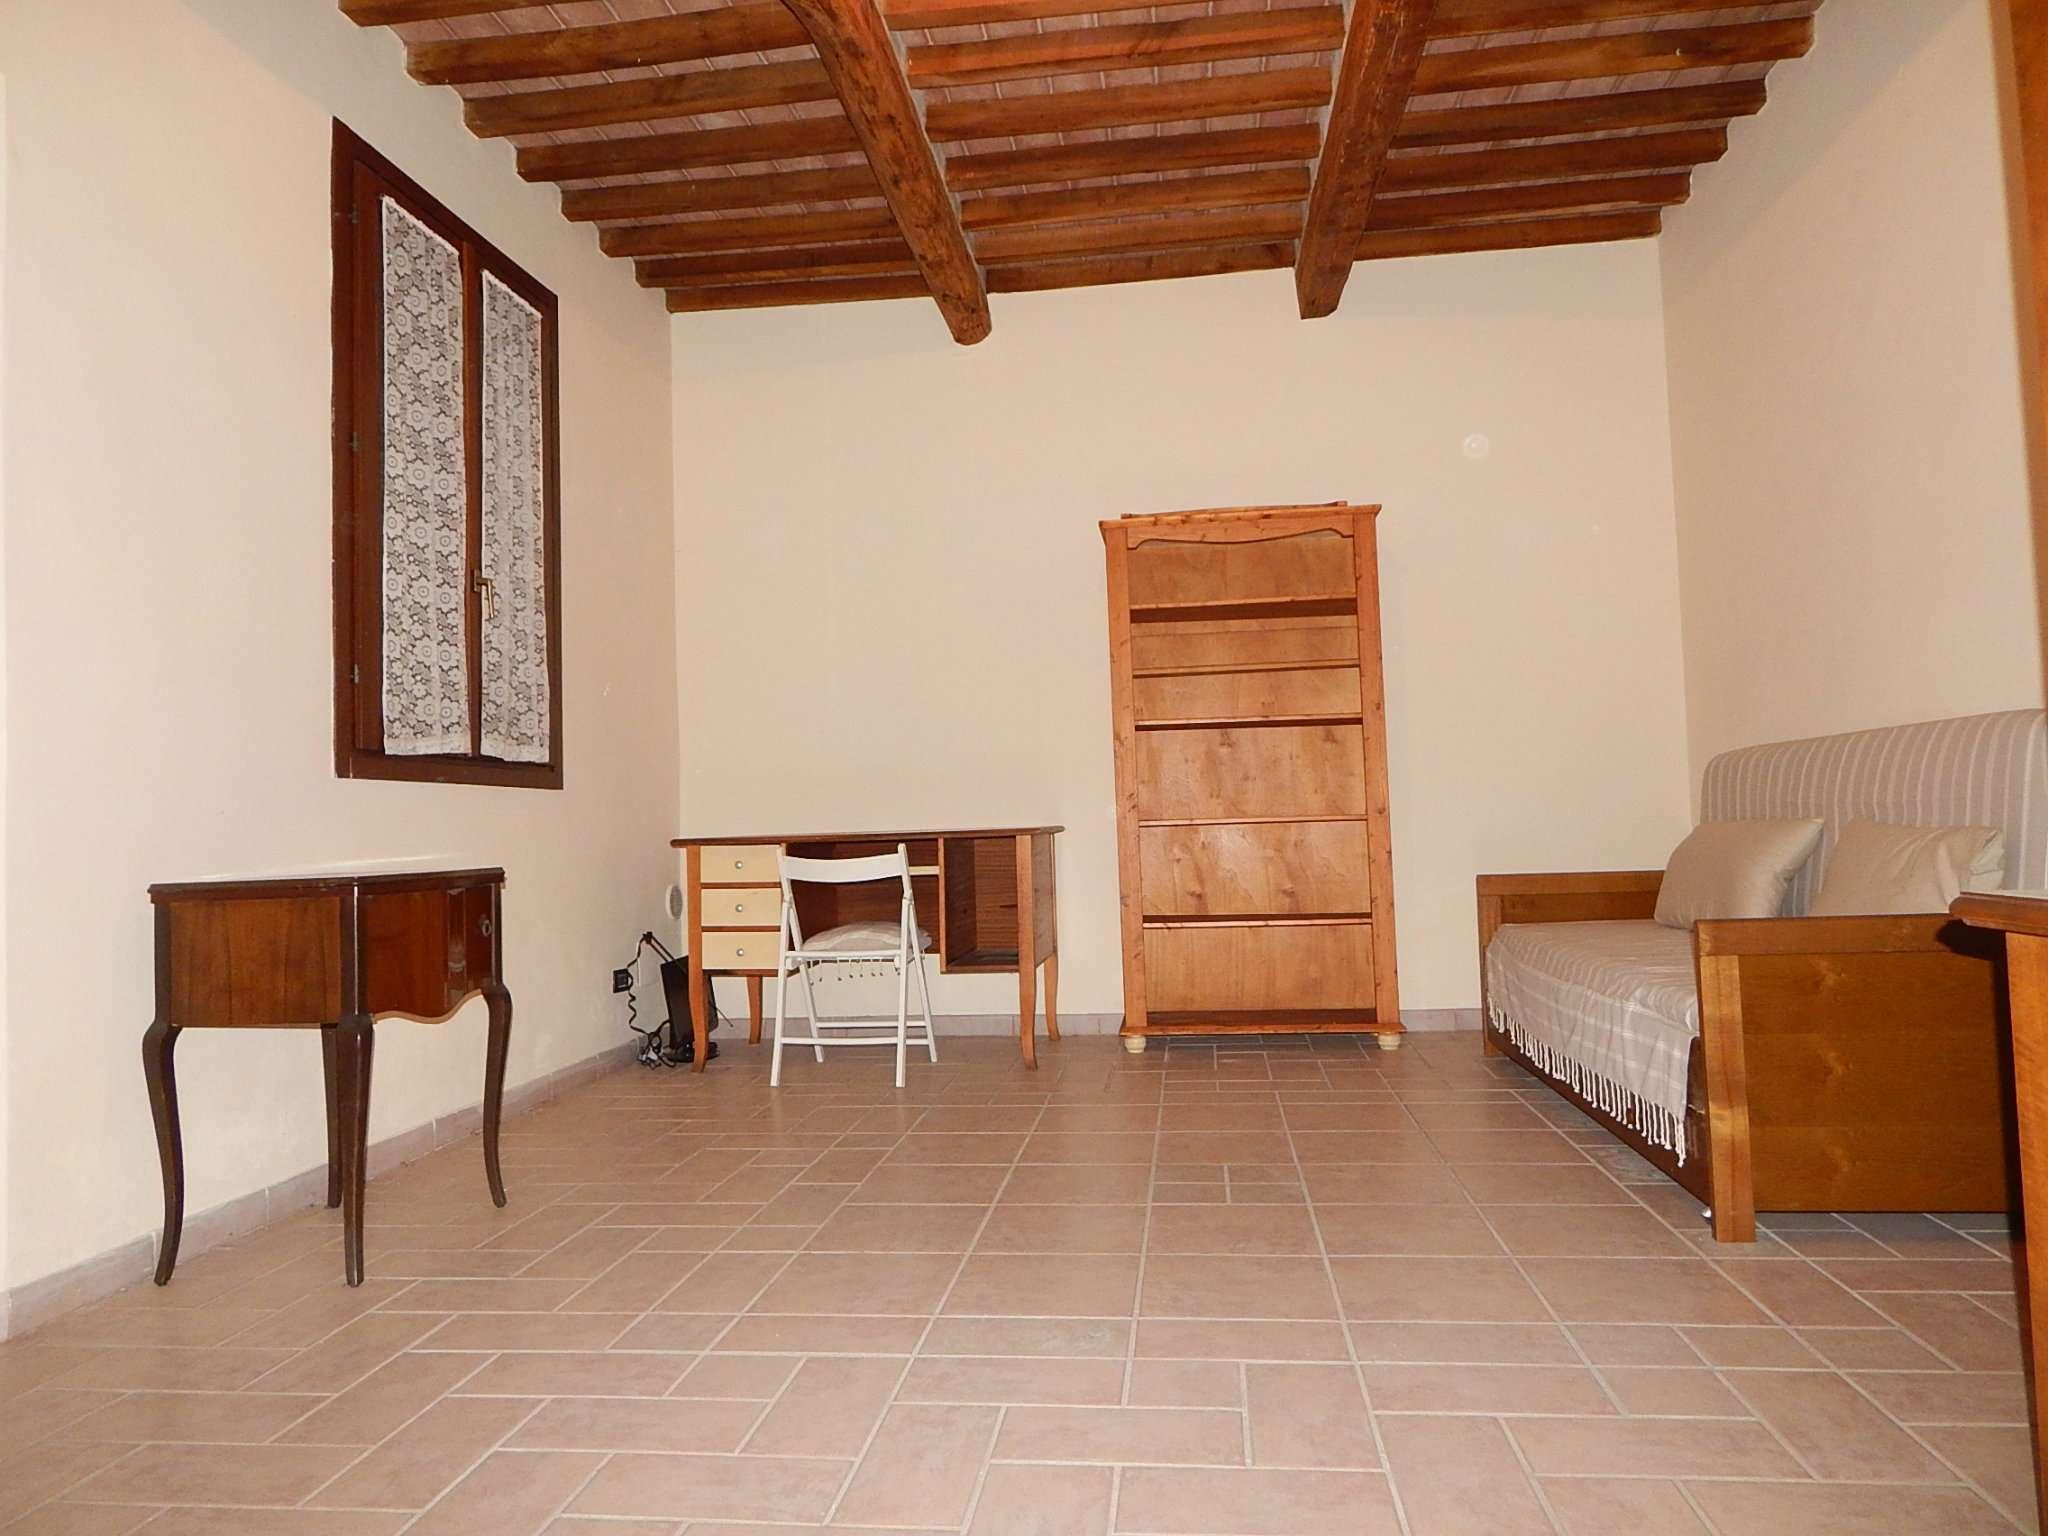 Bilocale Pisa Via Santa Bona 3